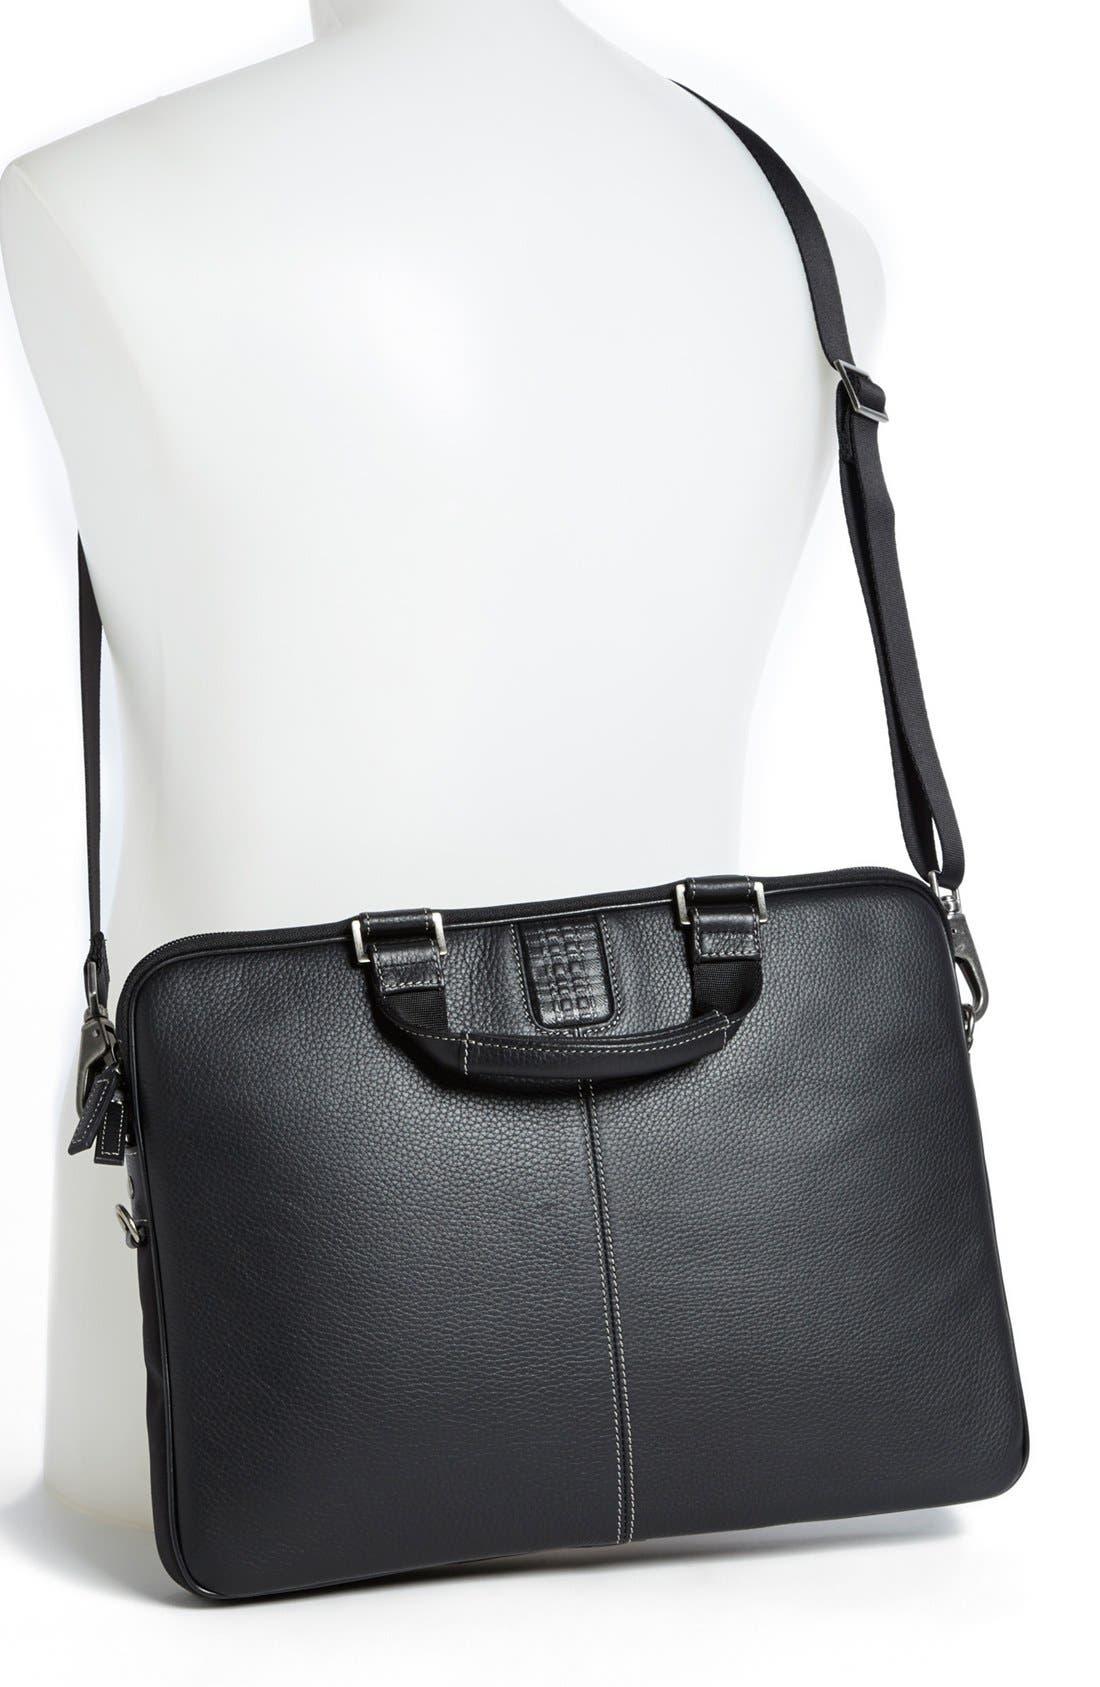 BOCONI, 'Tyler' Leather Laptop Briefcase, Alternate thumbnail 2, color, BLACK/ KHAKI